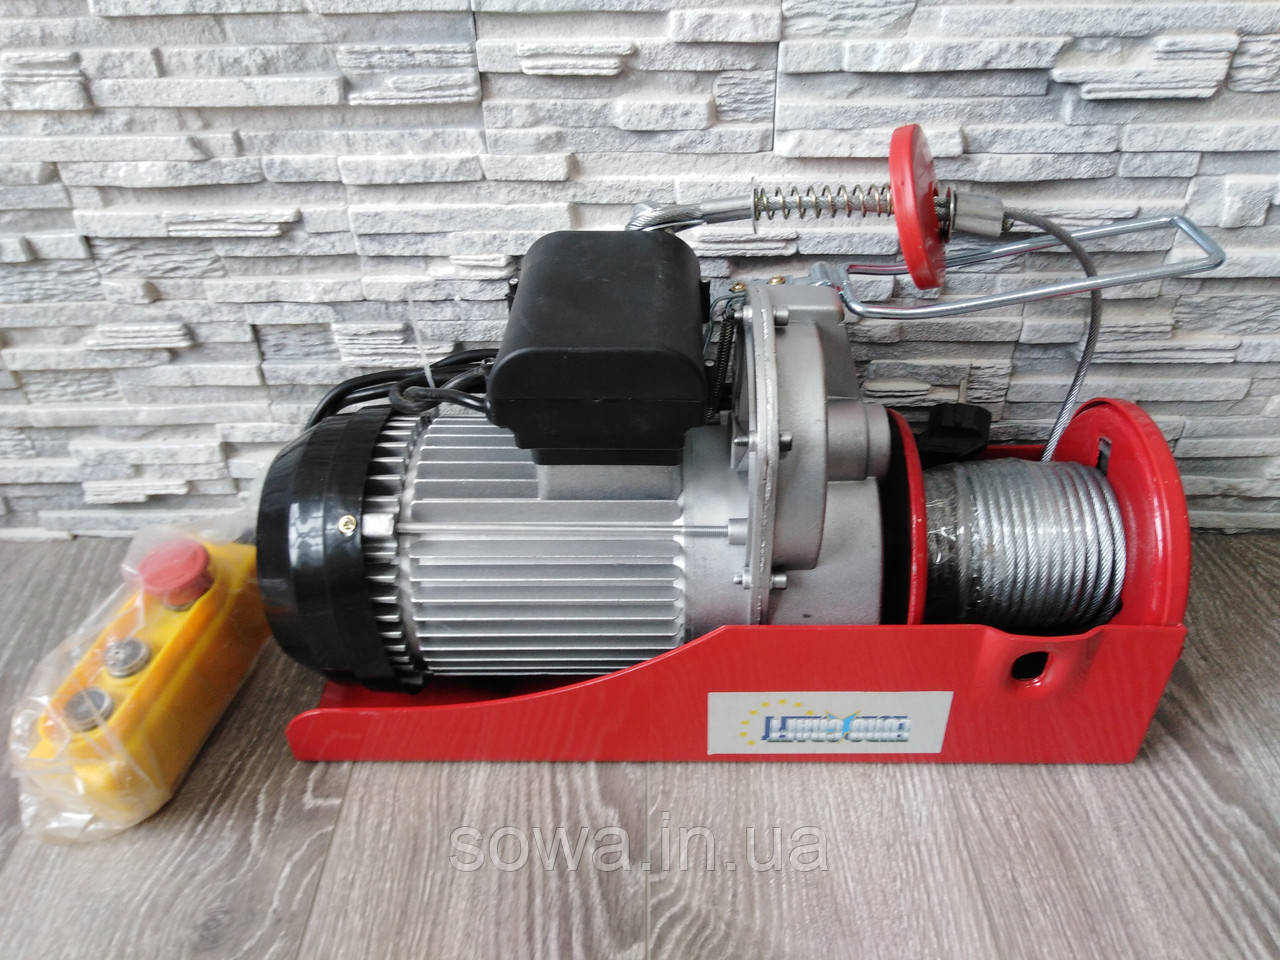 ✔️ Тельфер Euro Craft HJ208 . 500/1000kg